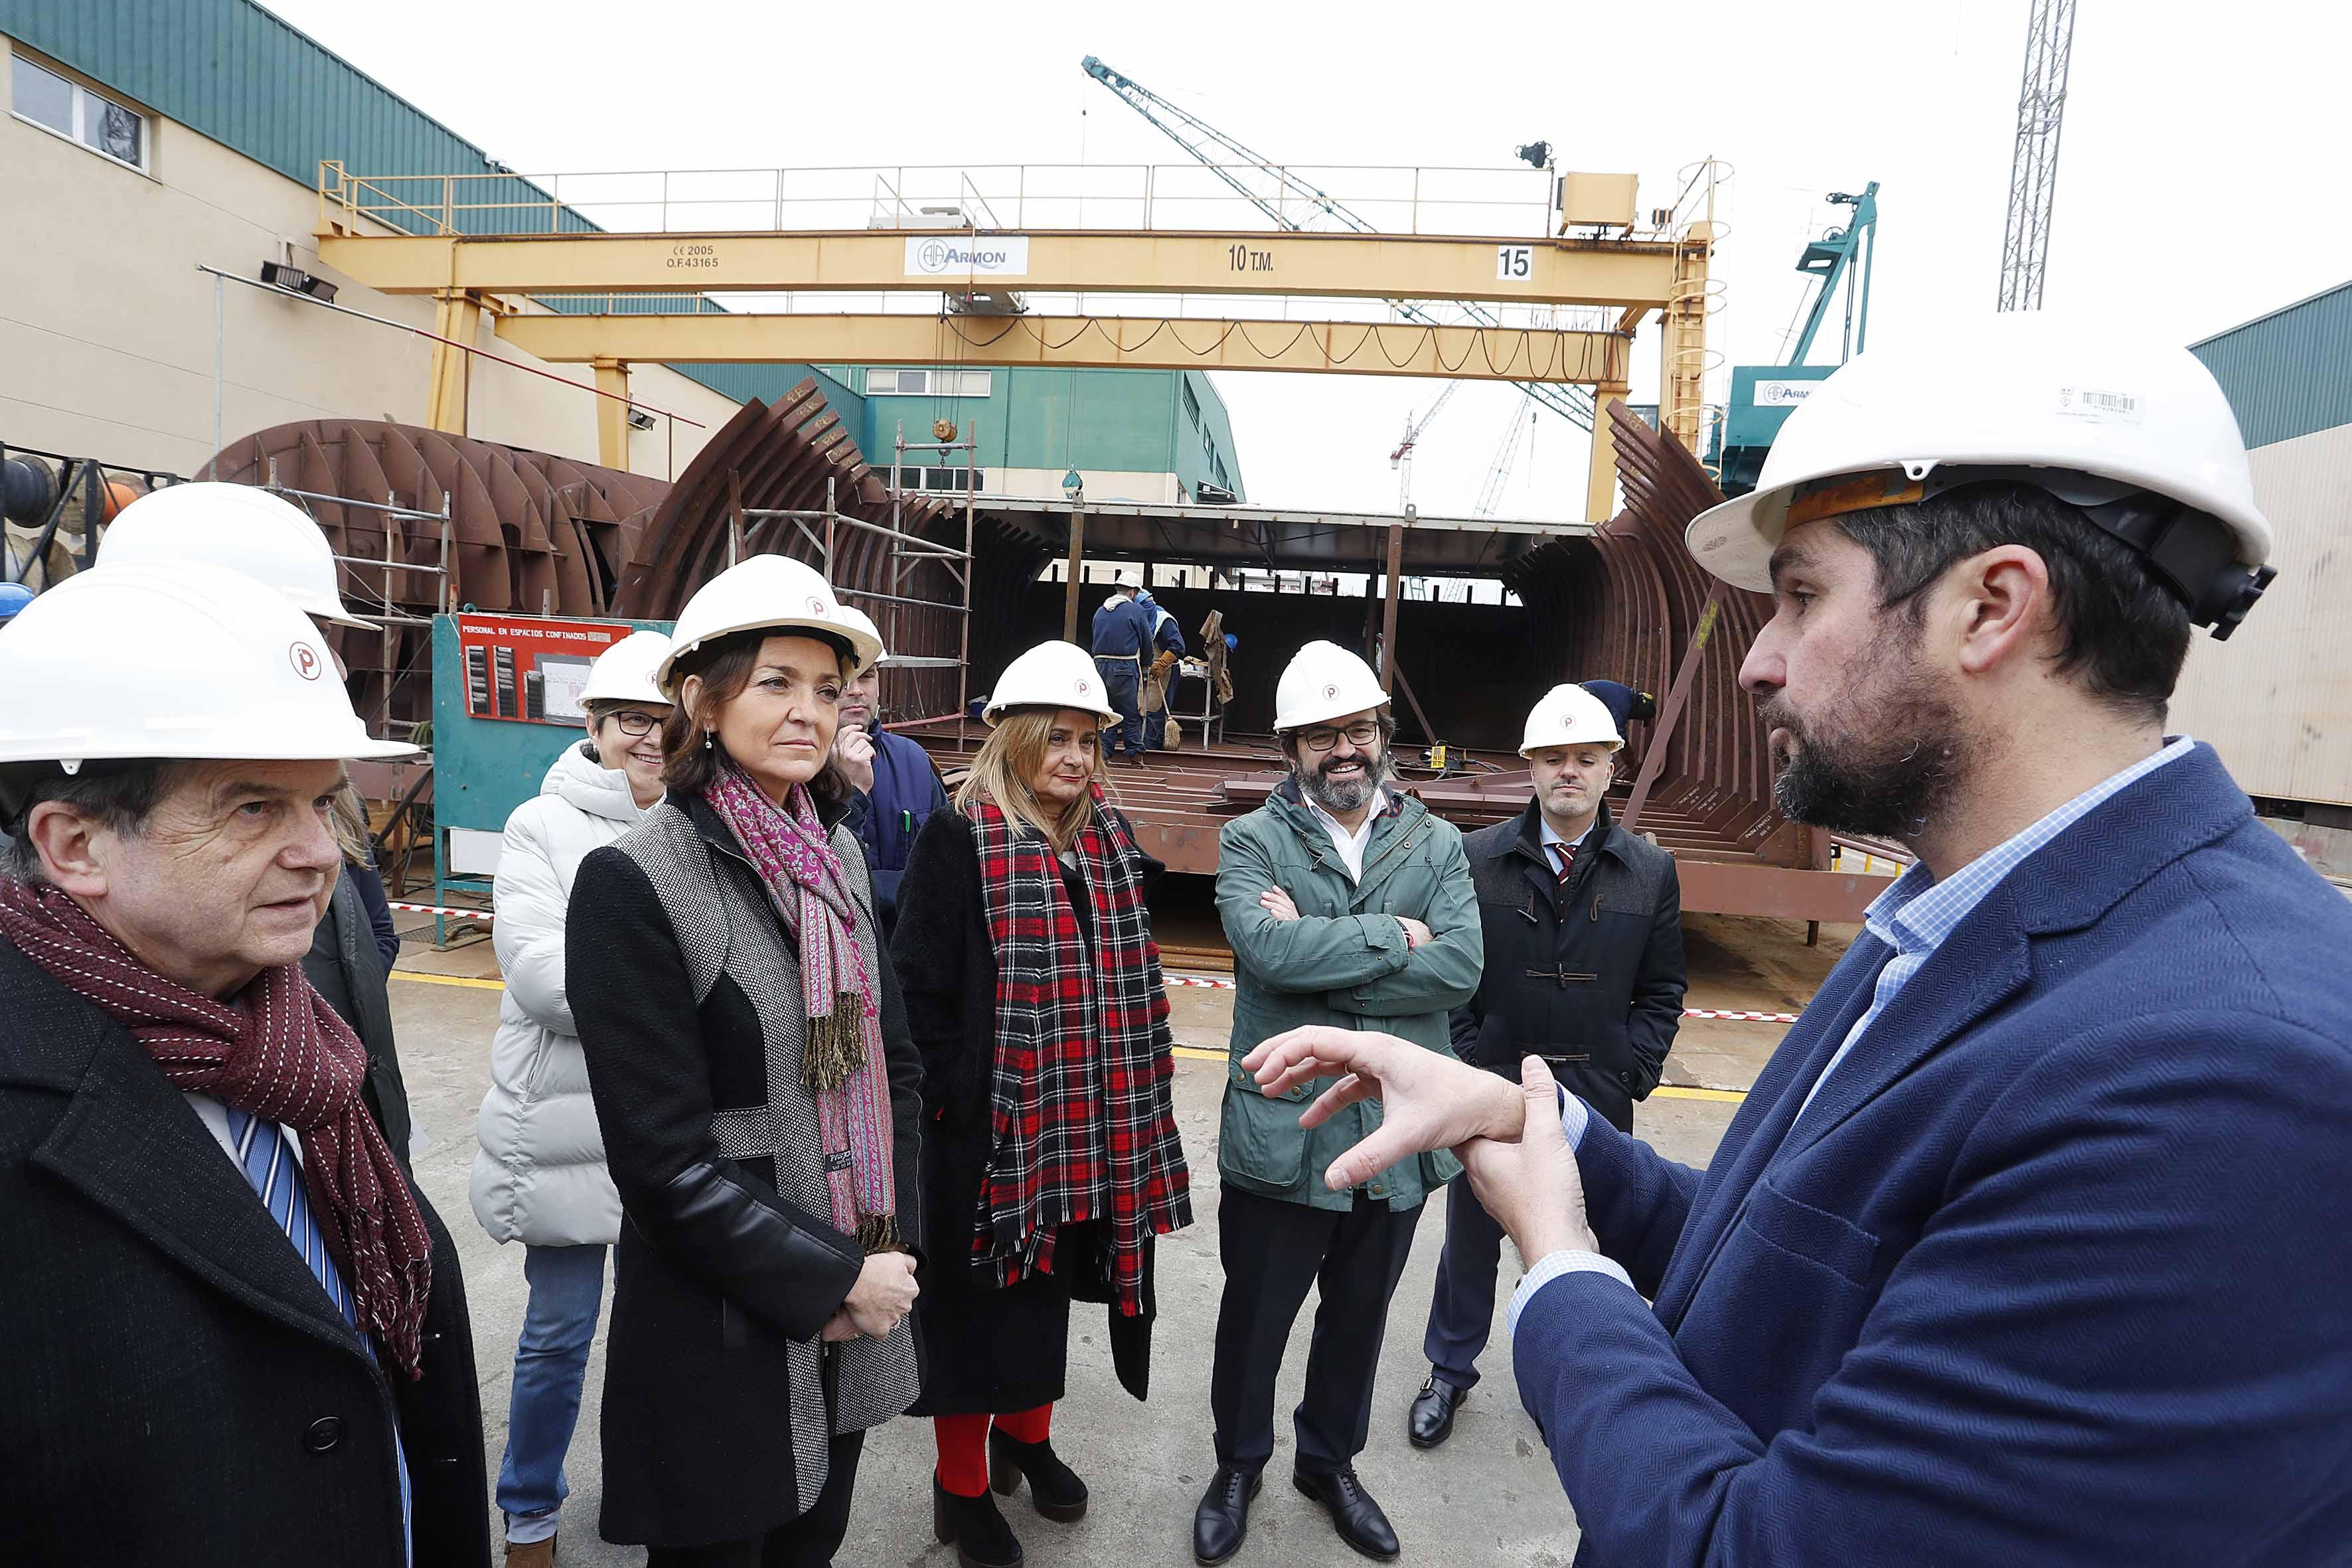 Spanish Minister of Industry Visits Nueva Pescanova's Shipyard, Surimi Processing Plant